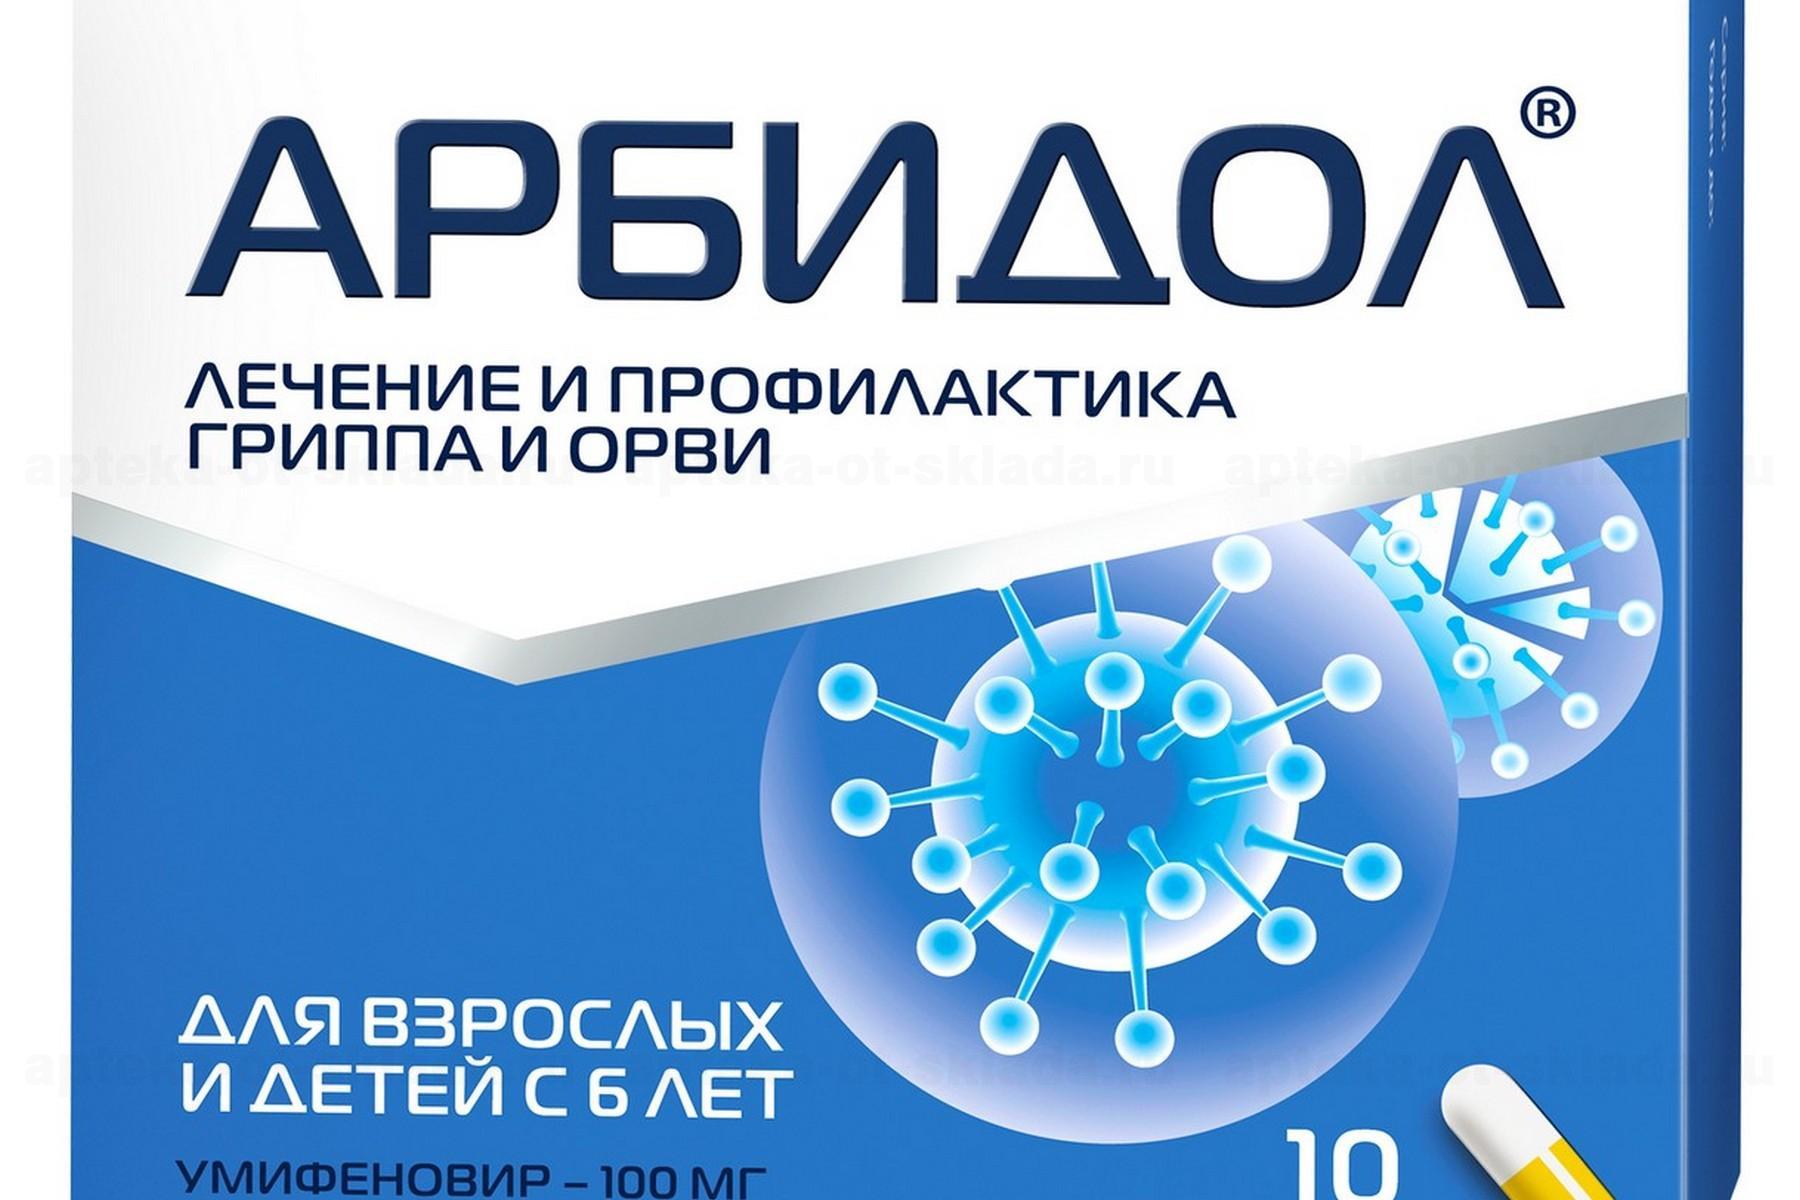 Арбидол капс 100мг N 10 купить в Копейск, описание и инструкция по применению лекарства, купить Арбидол капс 100мг N 10 заказ на Apteka-ot-sklada.ru